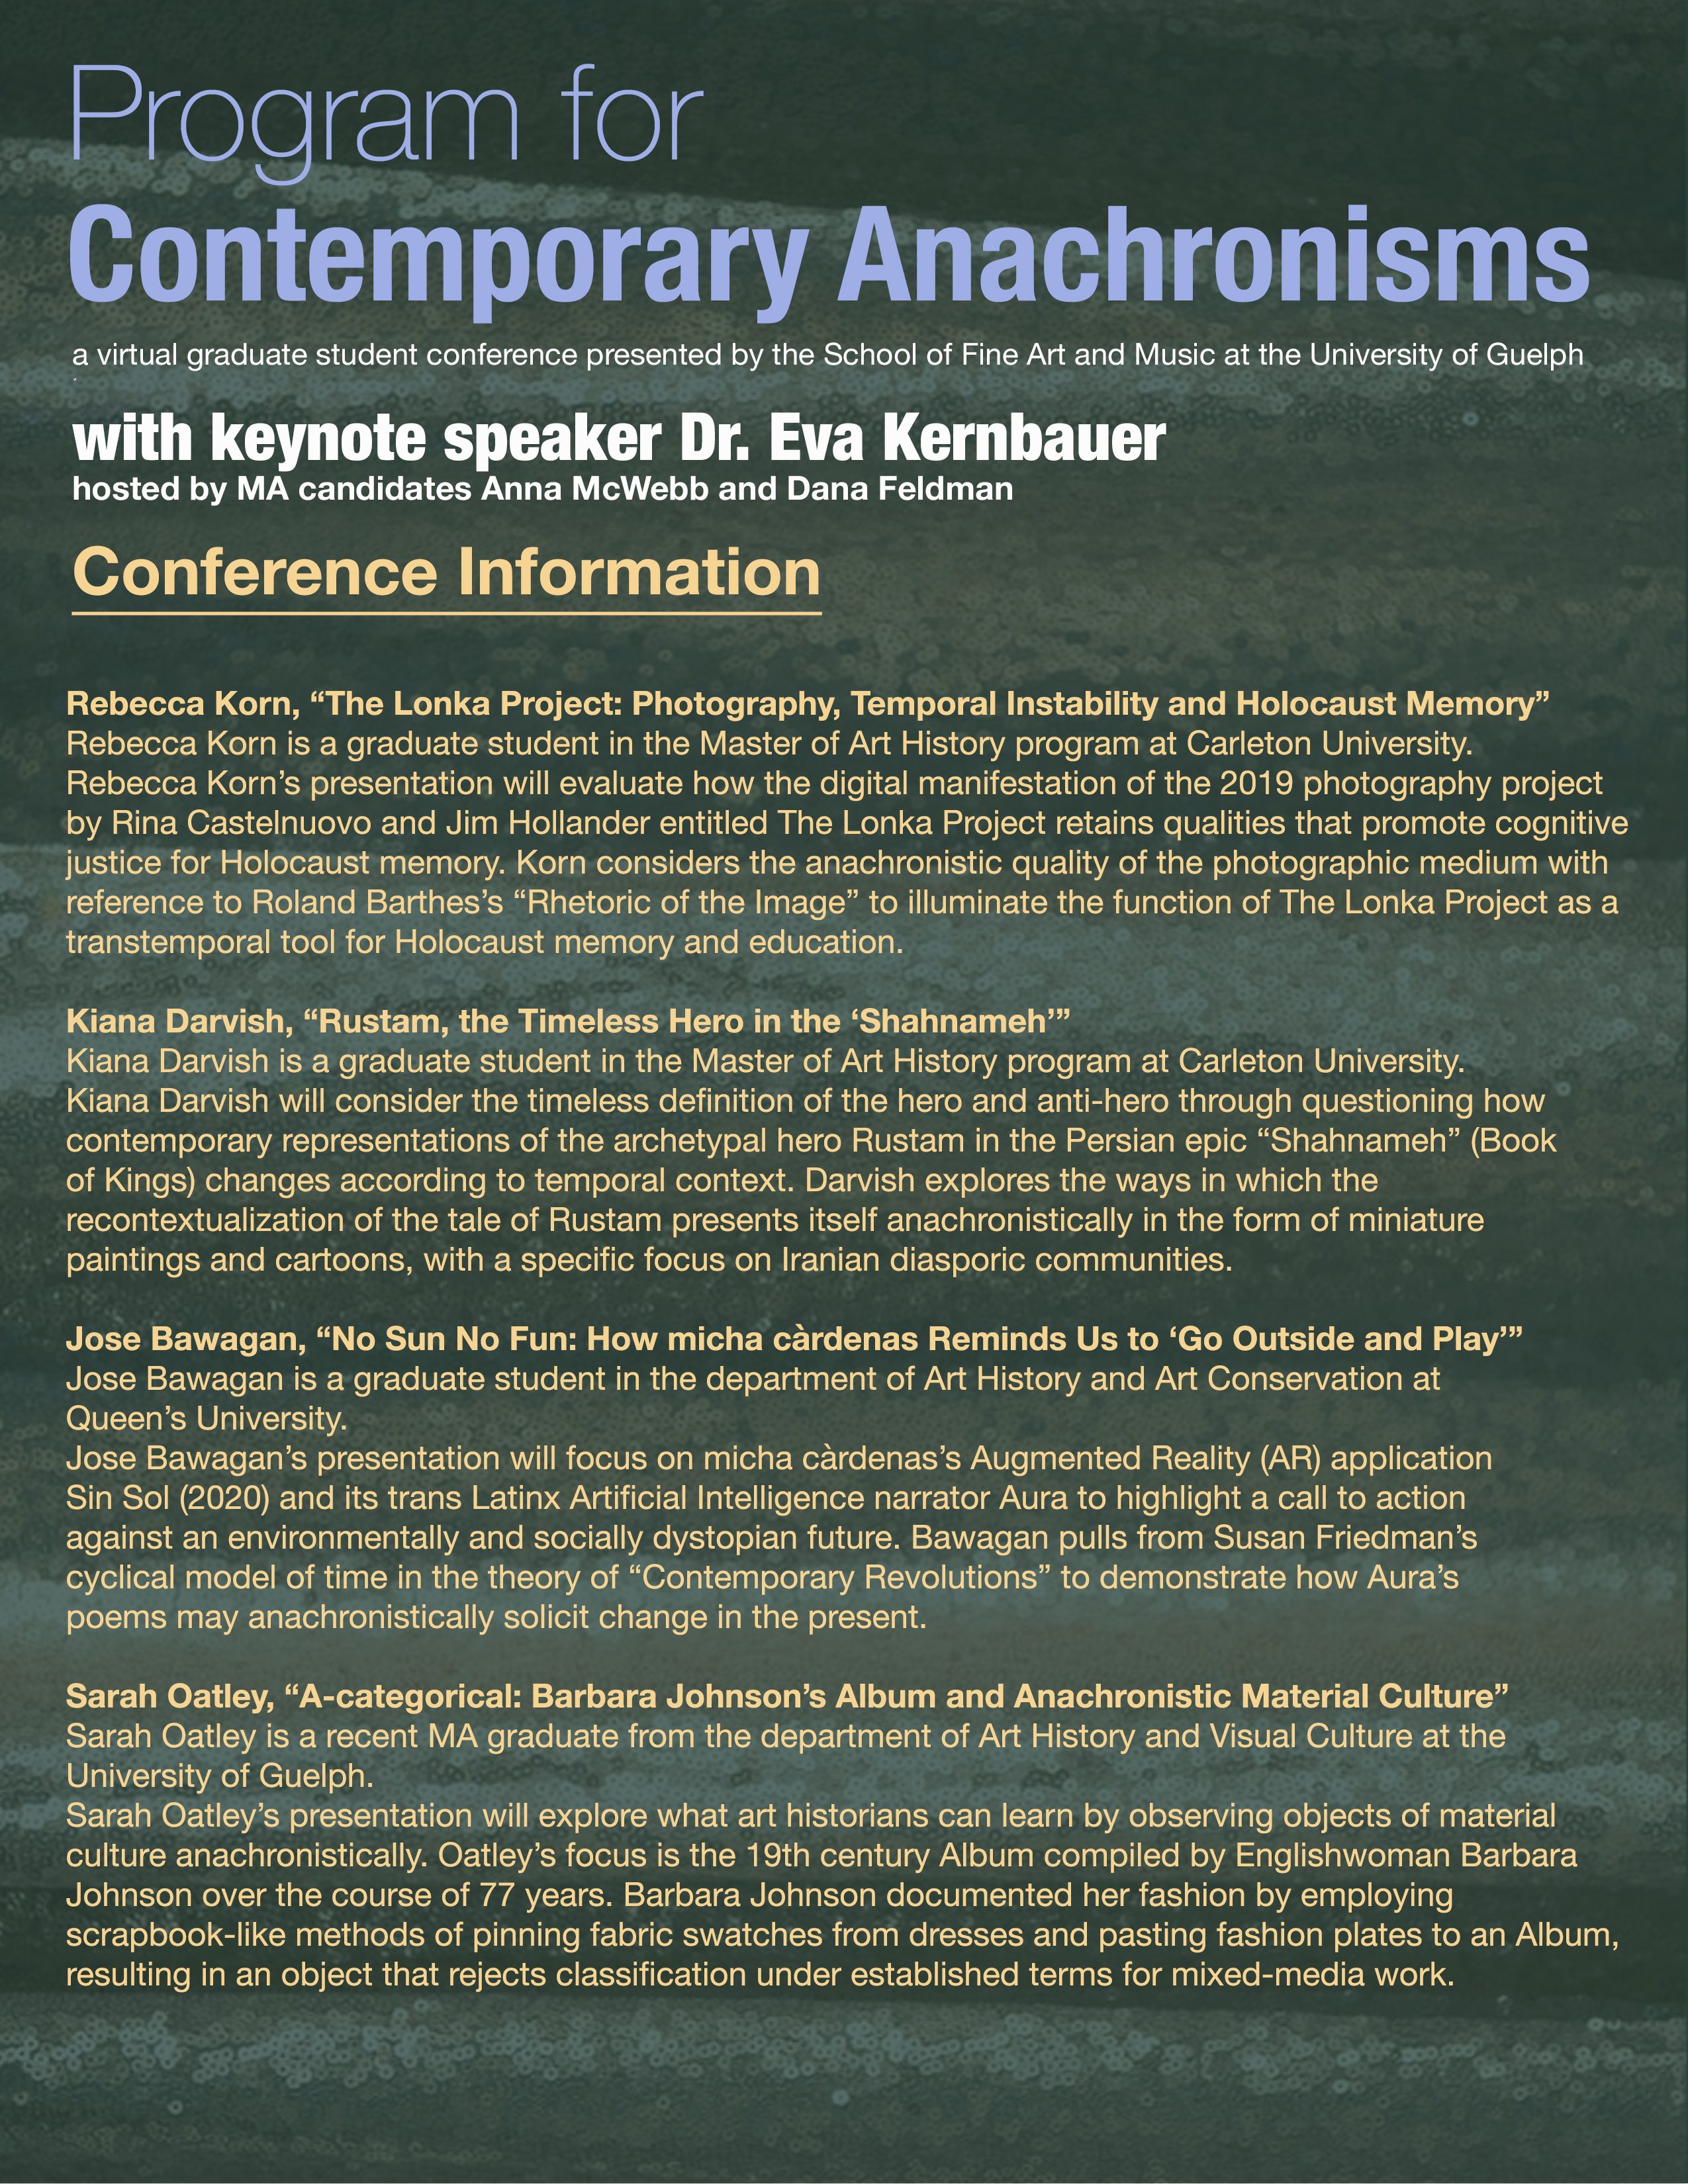 Contemporary Anachronisms program 002 Page 2